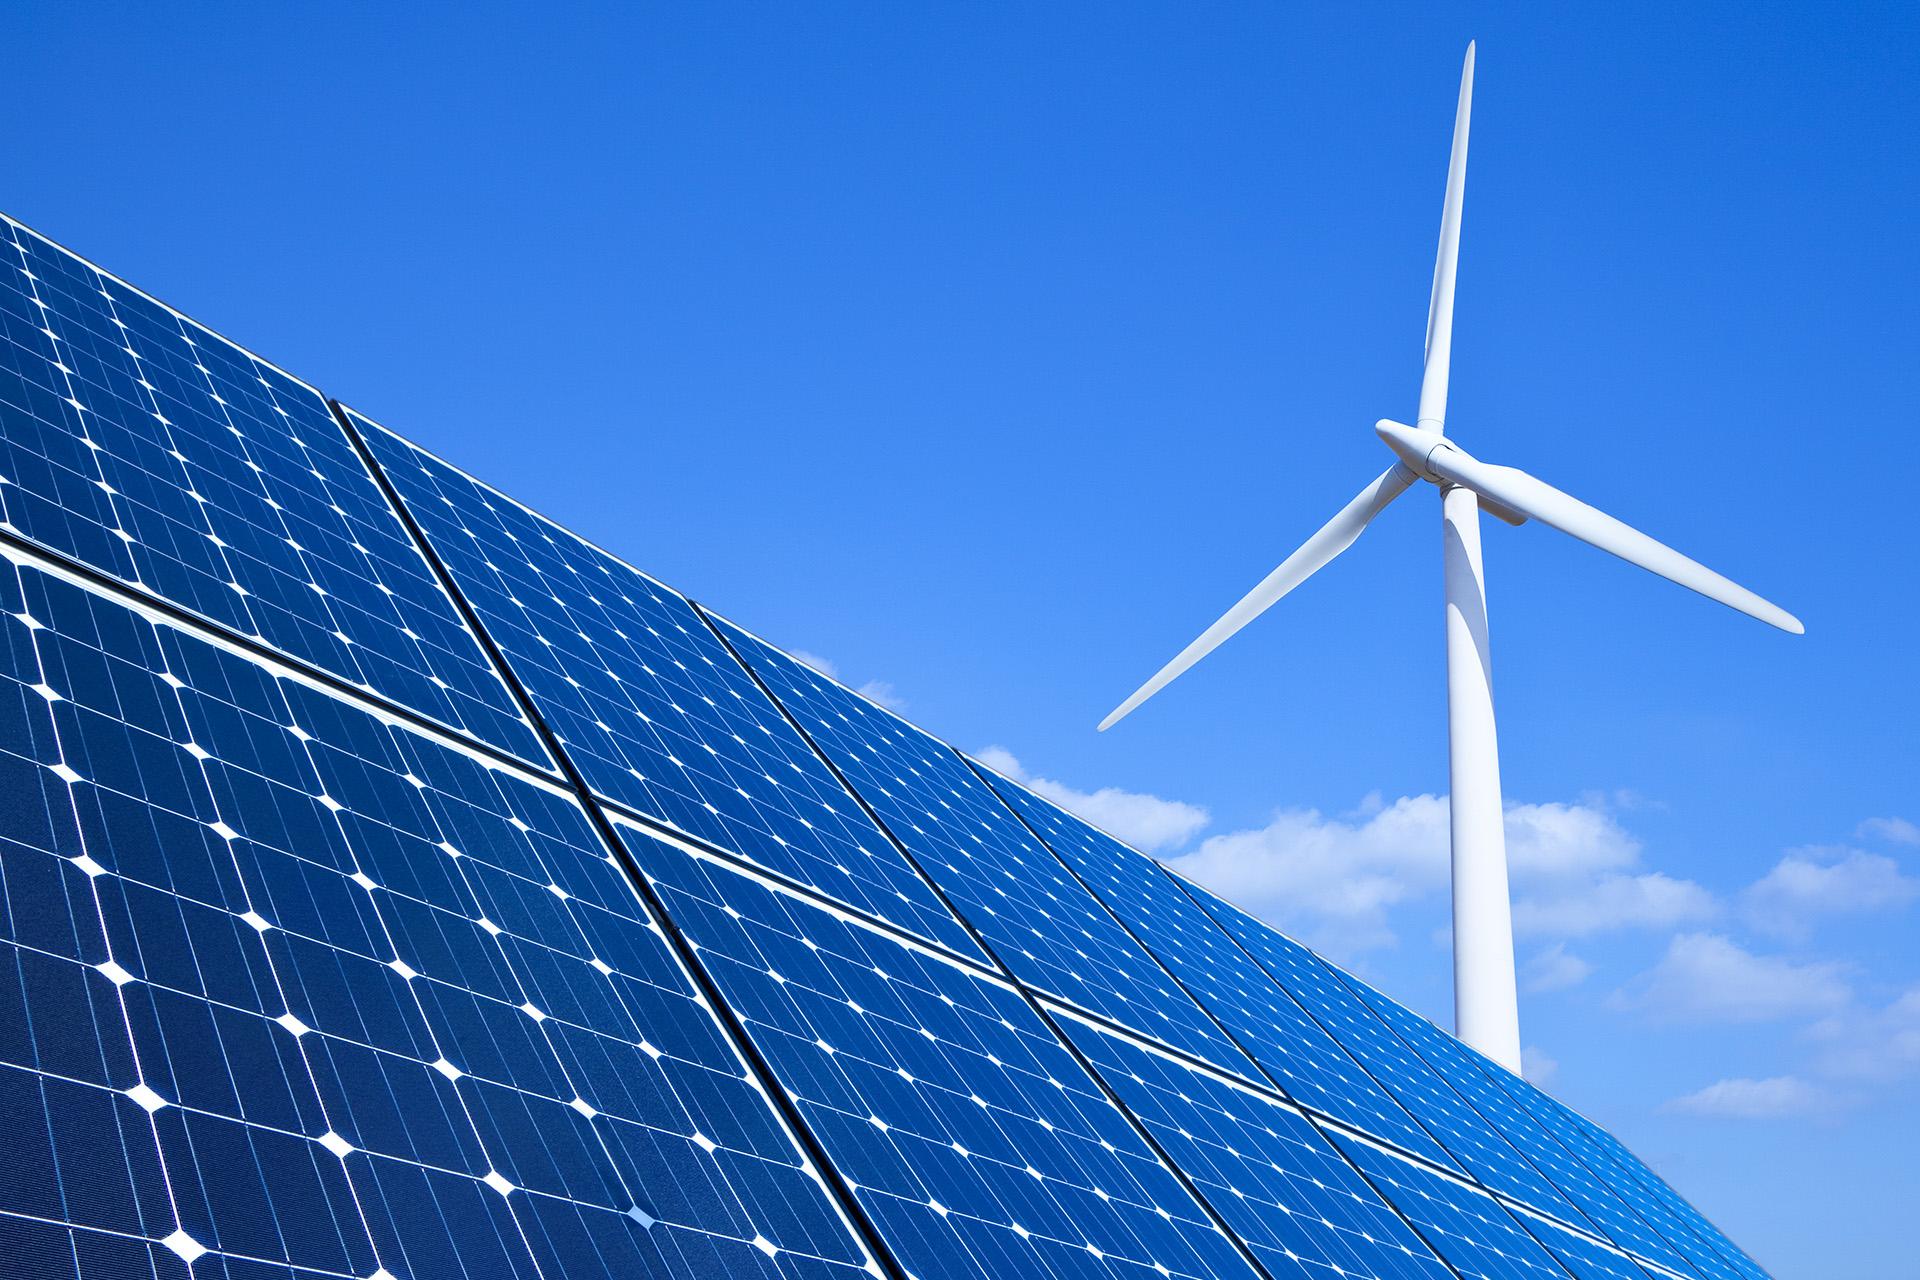 https://batterywarehouseinc.com/wp-content/uploads/2020/03/Solar_Wind.jpg